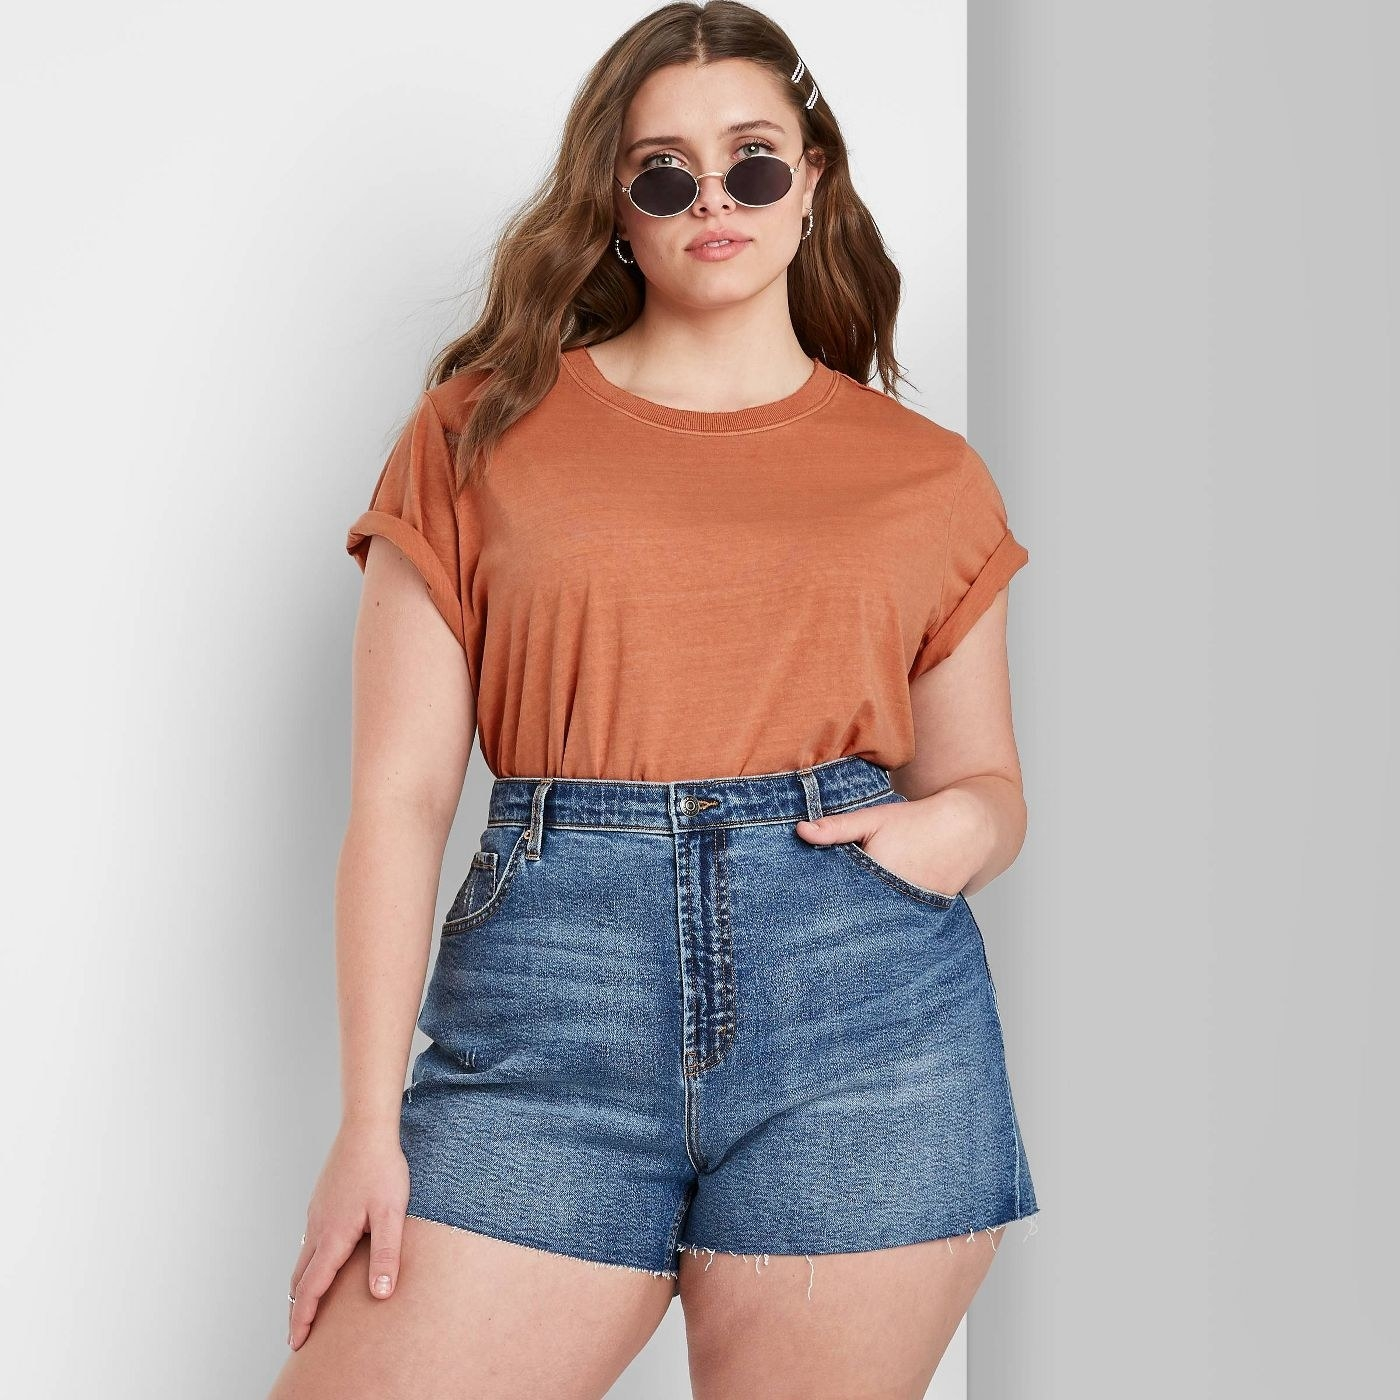 Model medium wash jean shorts that stop mid-thigh